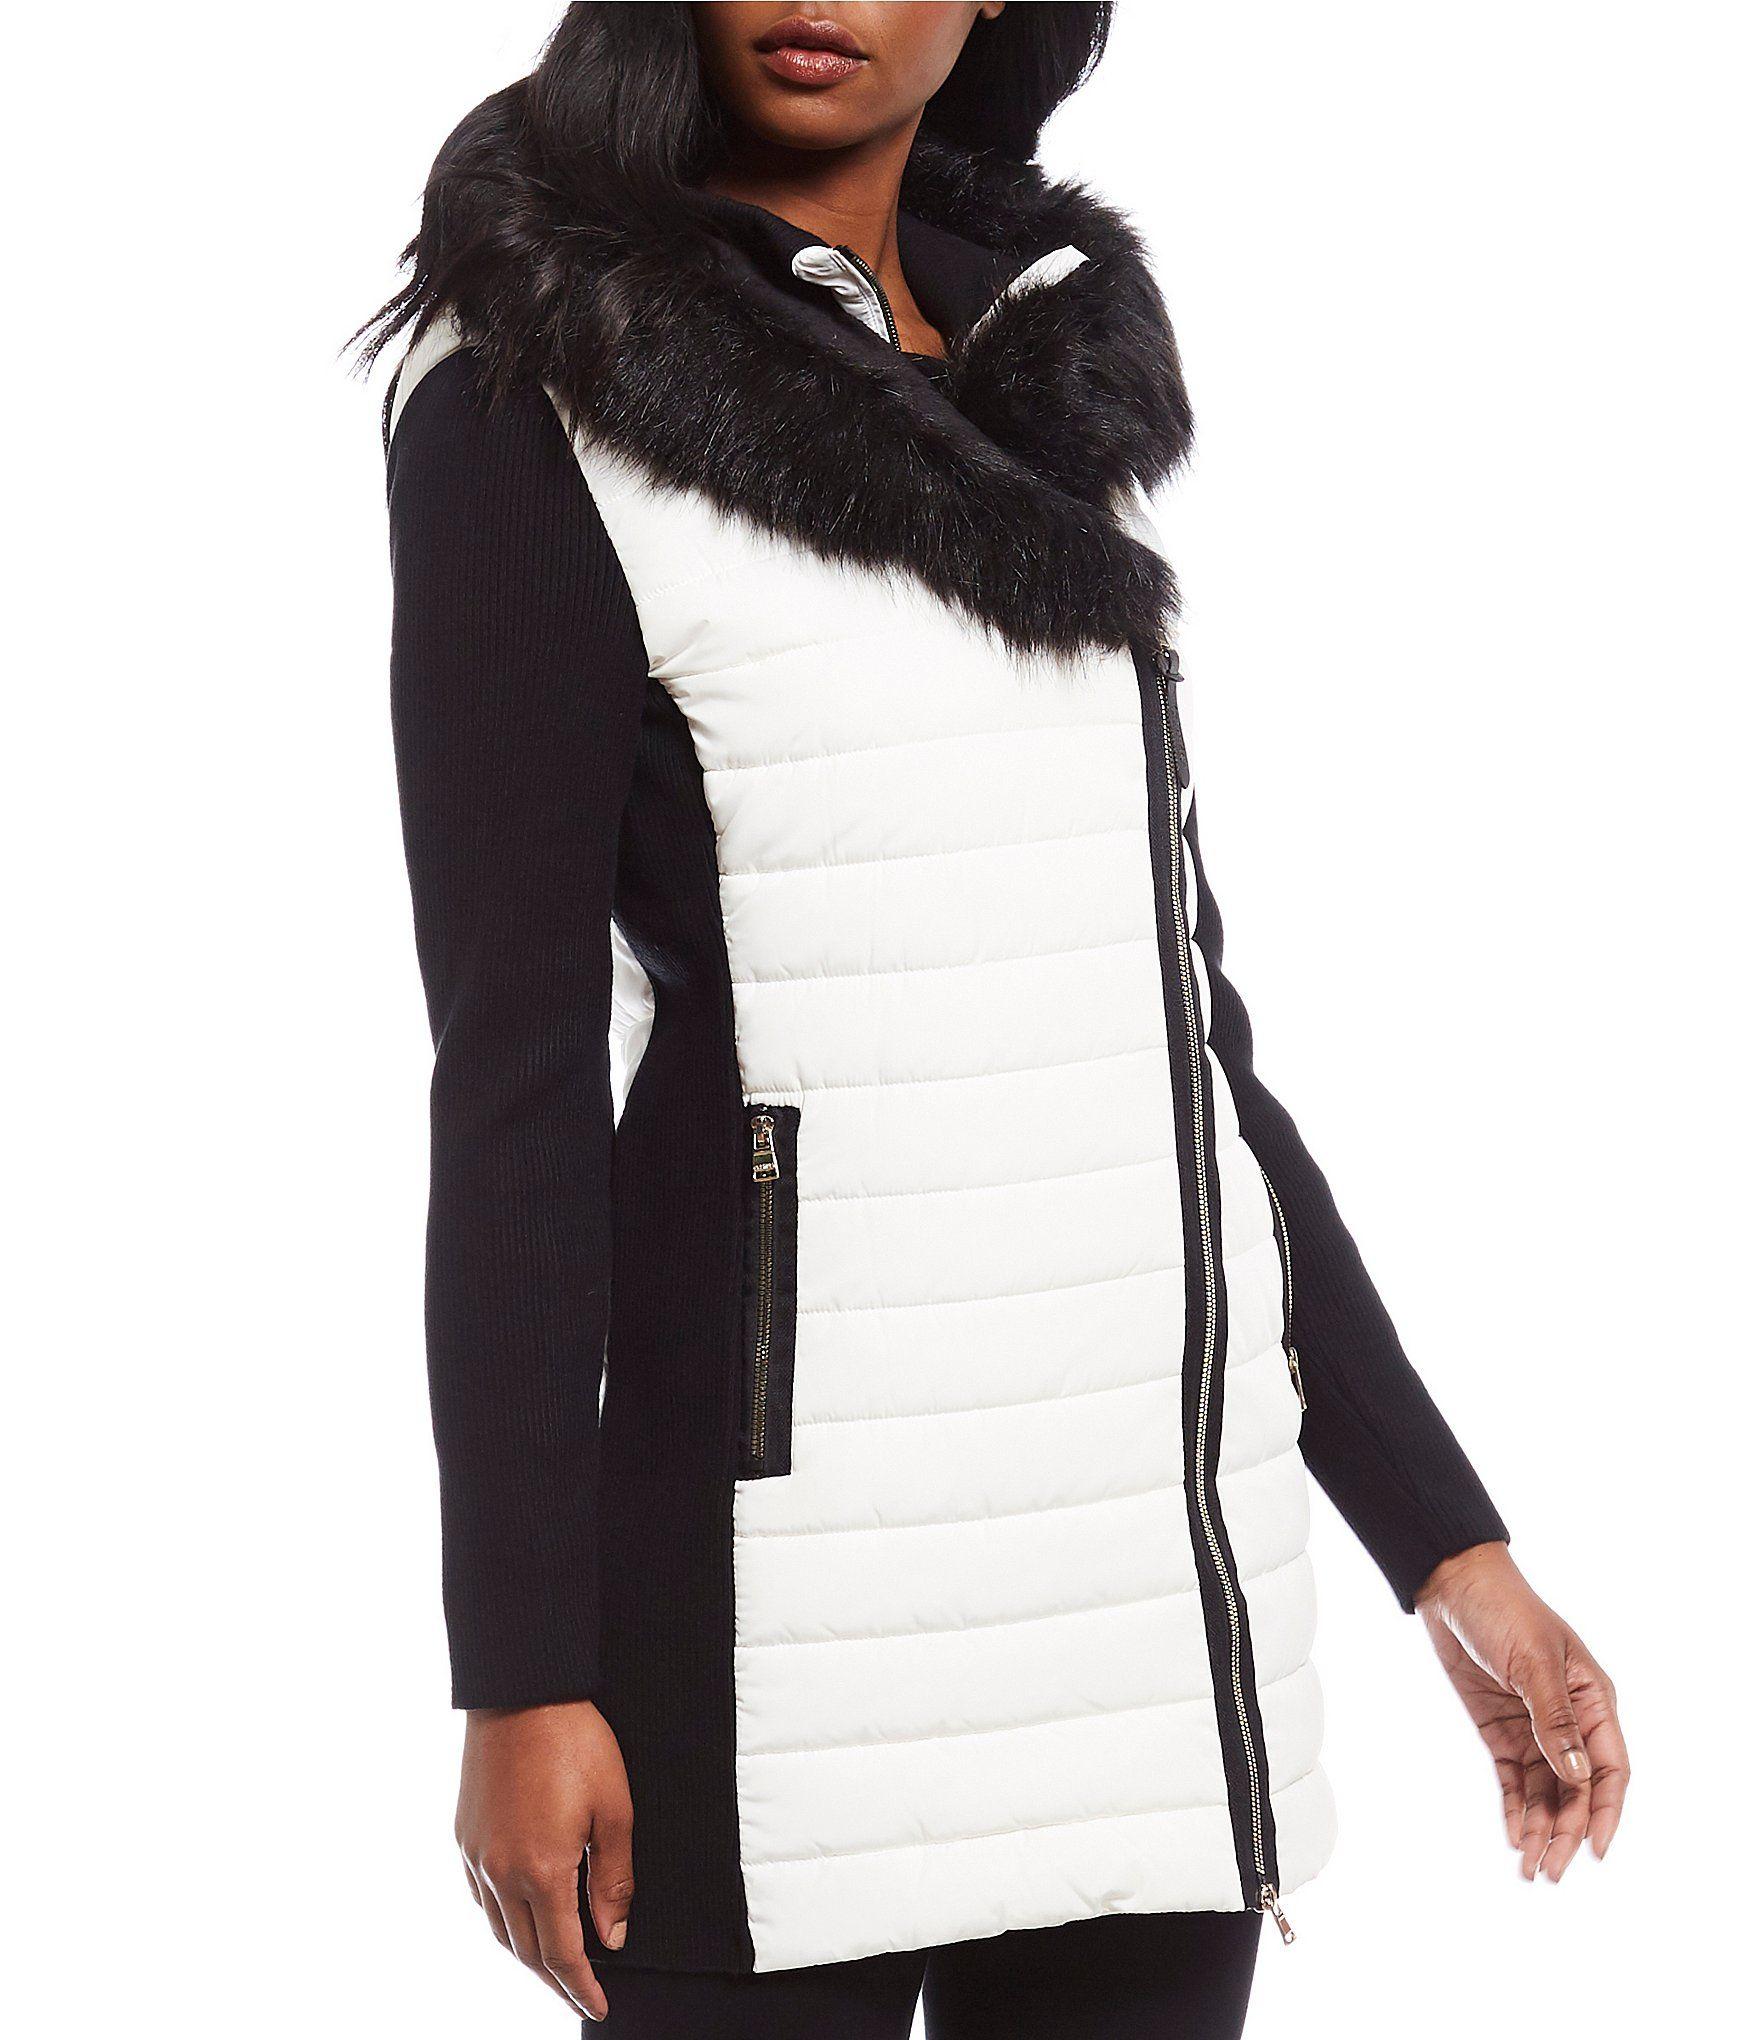 Shop For Calvin Klein Performance Faux Fur Trim Sweater Rib Sleeve Puffer Parka At Dillard S Visi Faux Fur Hooded Coat Leopard Print Long Coat Faux Fur Anorak [ 2040 x 1760 Pixel ]